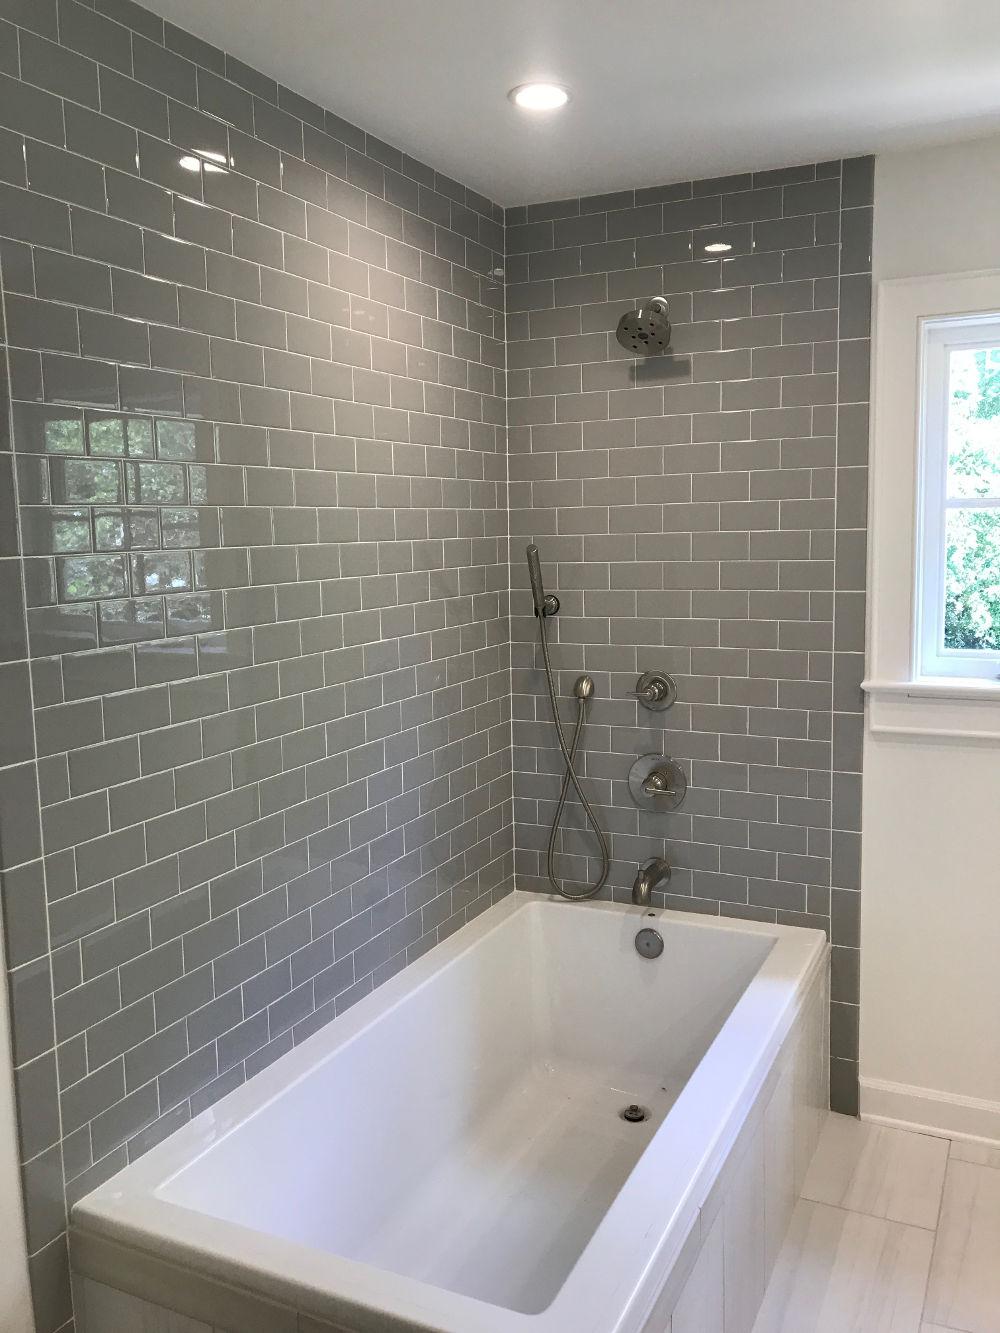 maax pivot shower door installation instructions